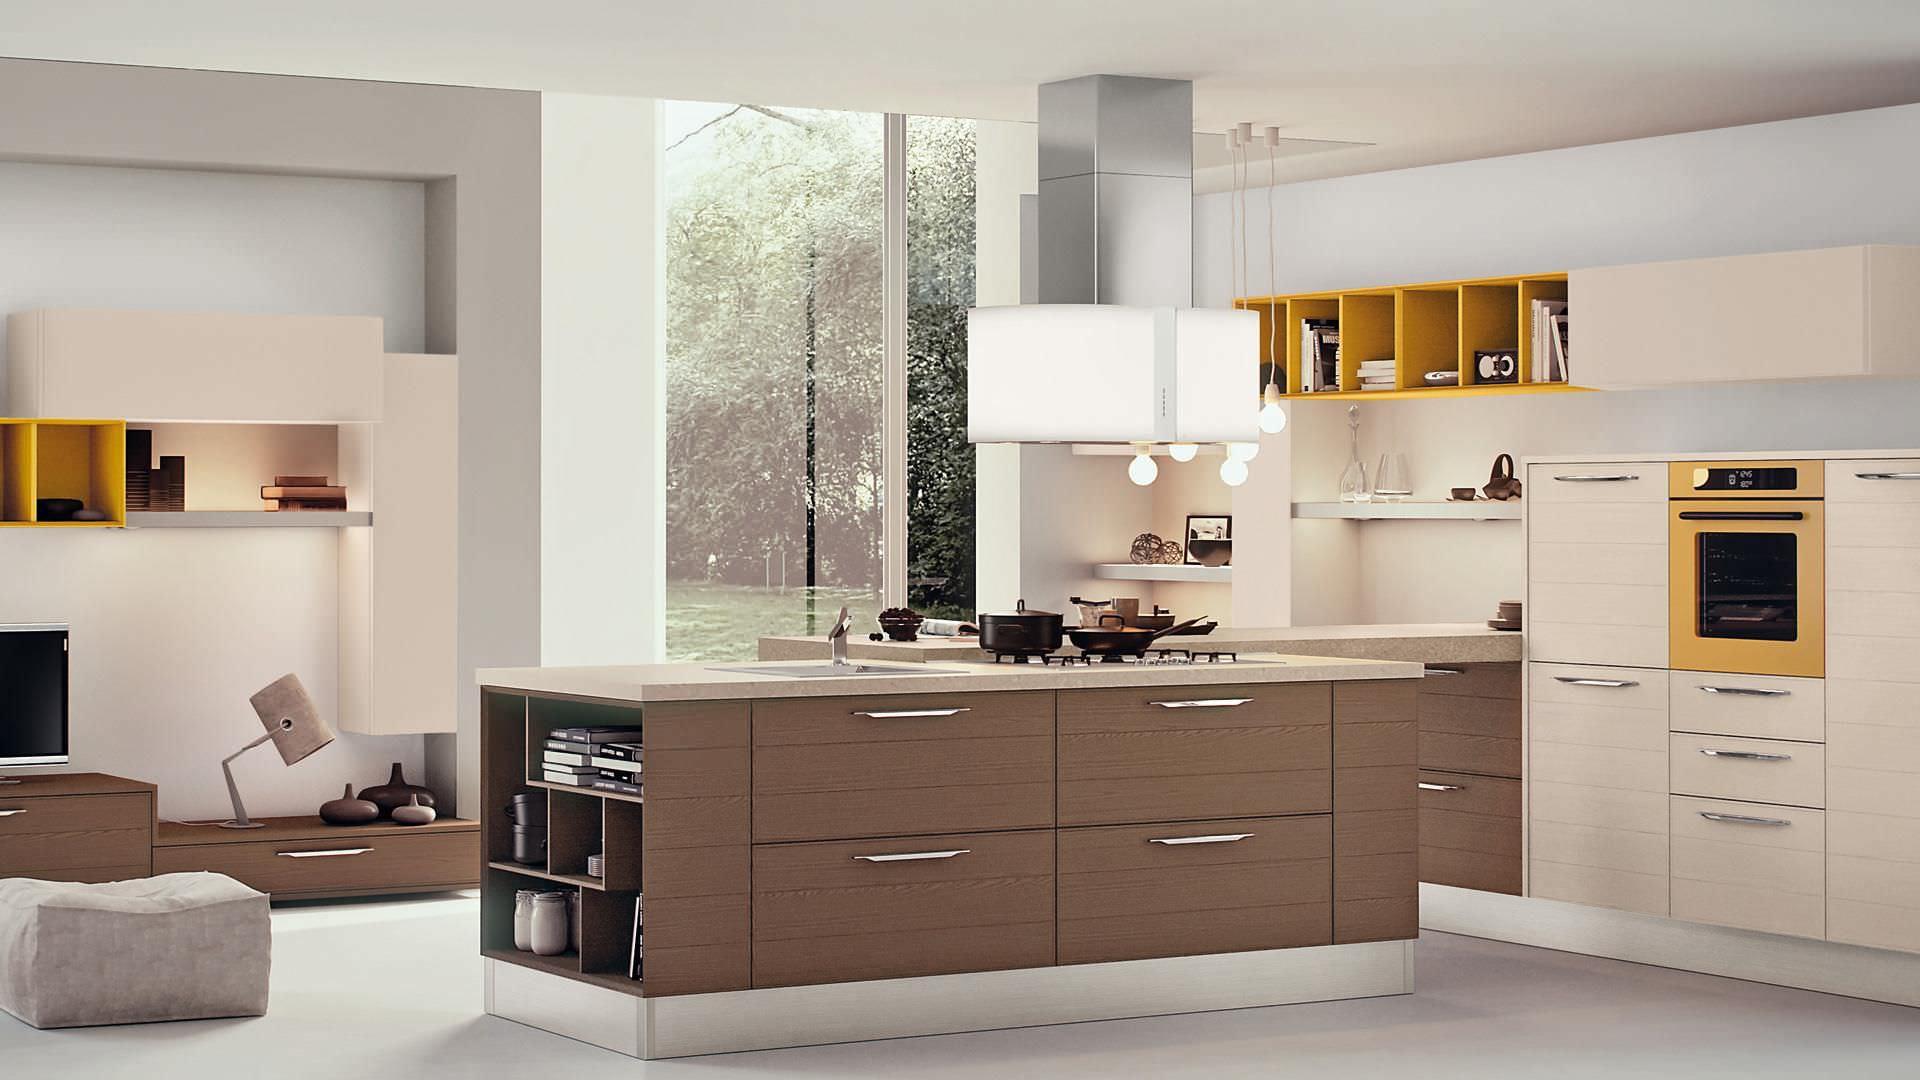 Moderne Küche / Holzfurnier / Kochinsel / lackiert - ADELE - CUCINE ...